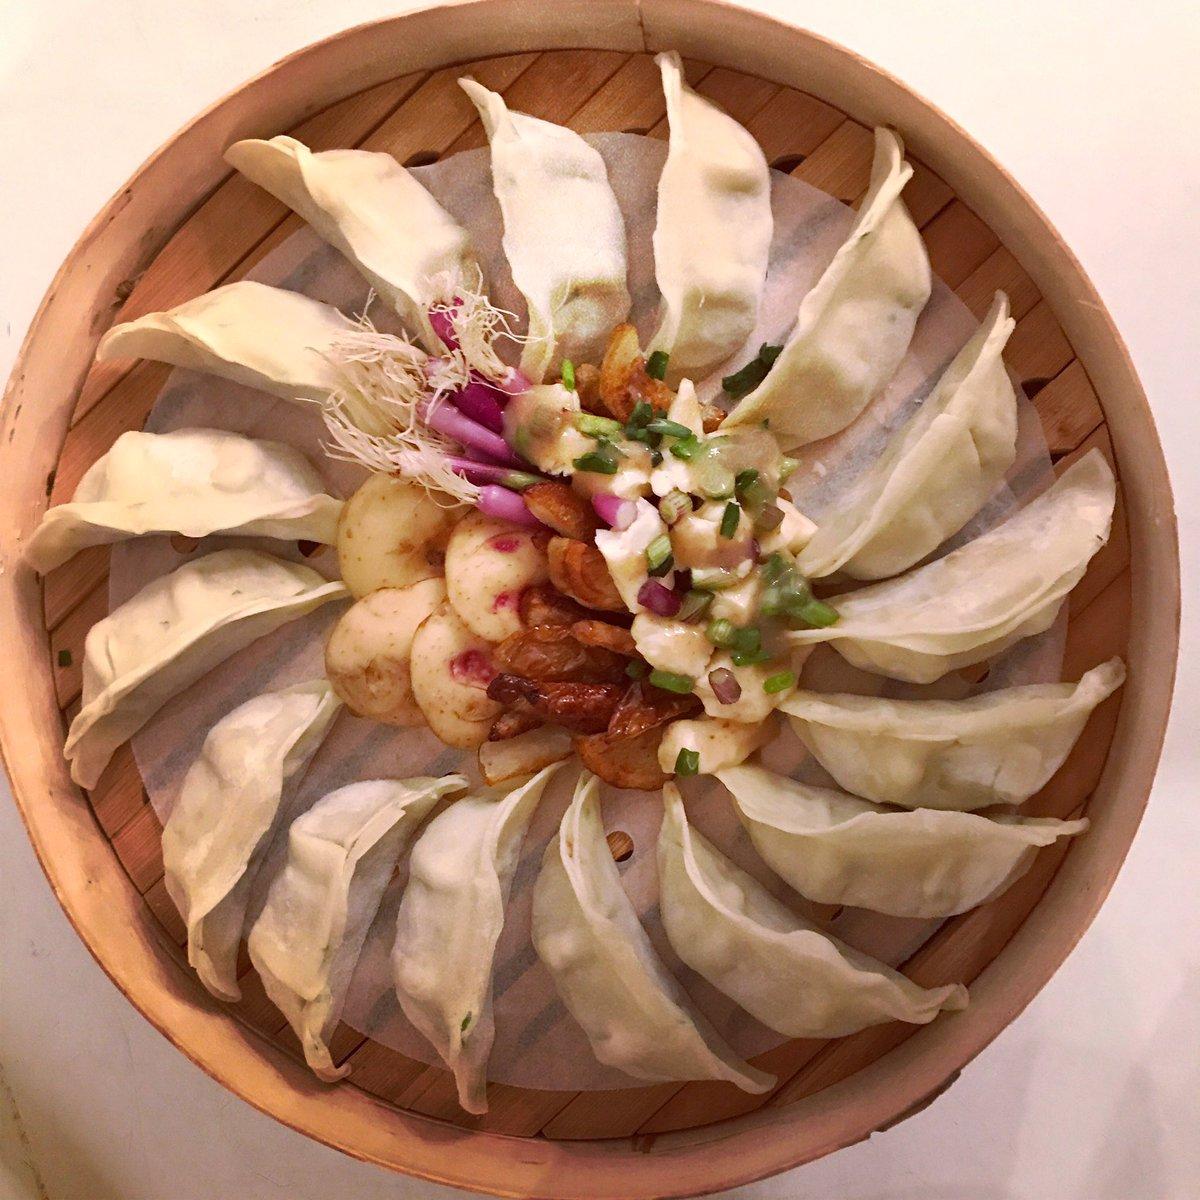 #Poutine #dumplings available tomorrow at @CwoodMarketYeg #secretmenuHD #yegfood #yeg #yegfoodie #secretmenu #bacon #canada150 <br>http://pic.twitter.com/7r26S5FVIp